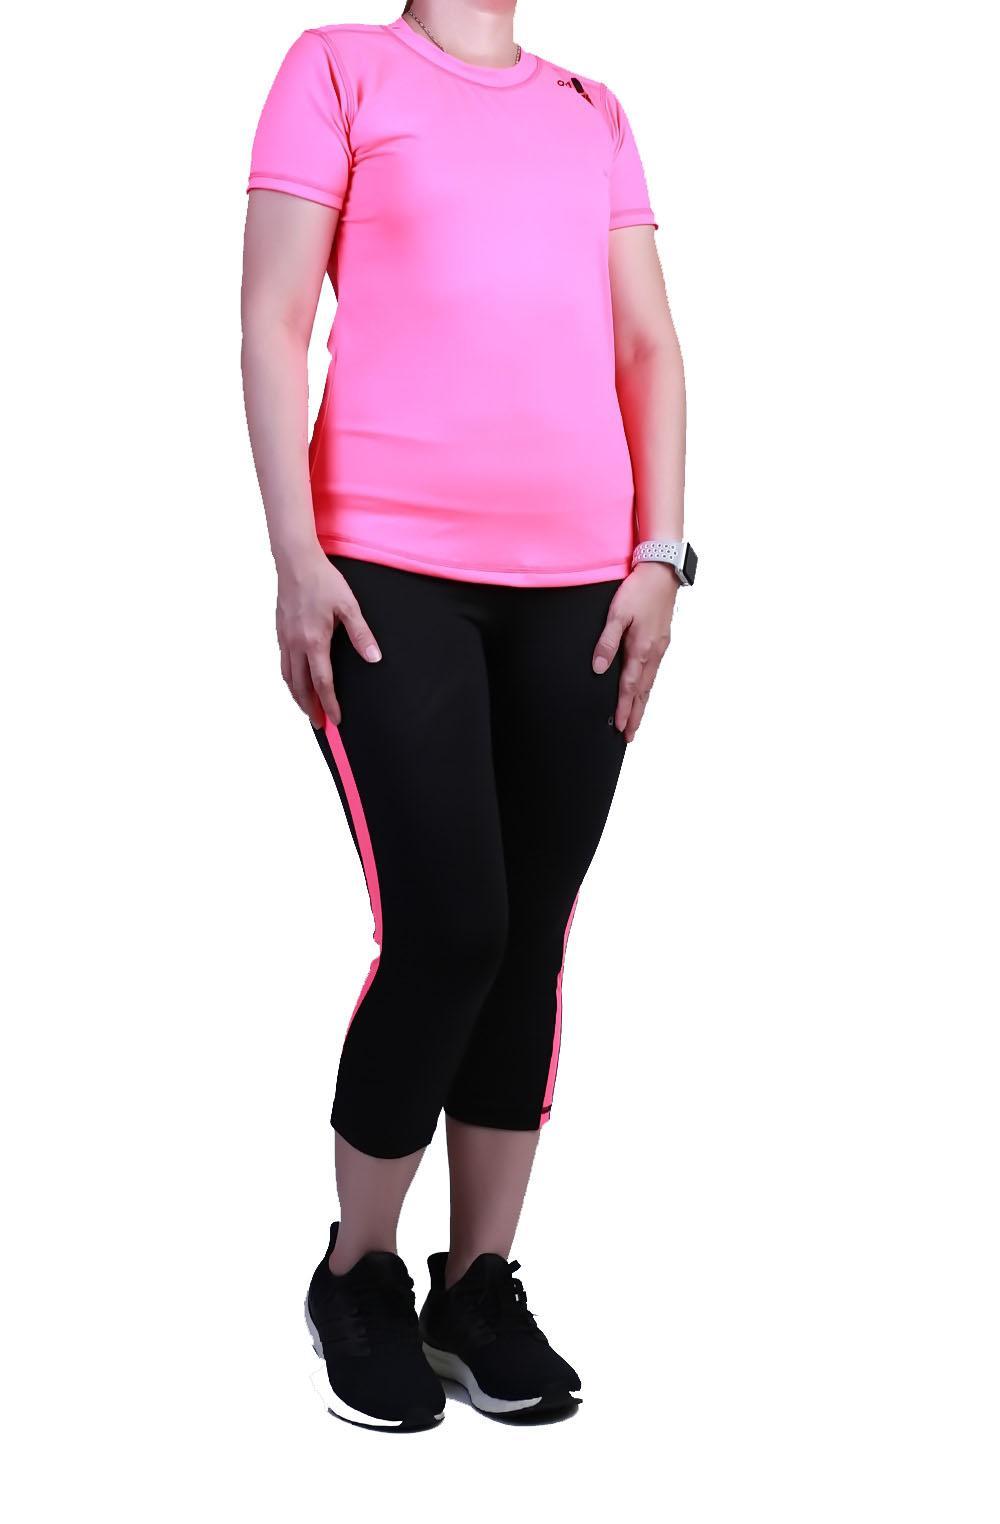 Ronaco Set Baju dan Celana Senam Wanita SBS1 - PINK All Size